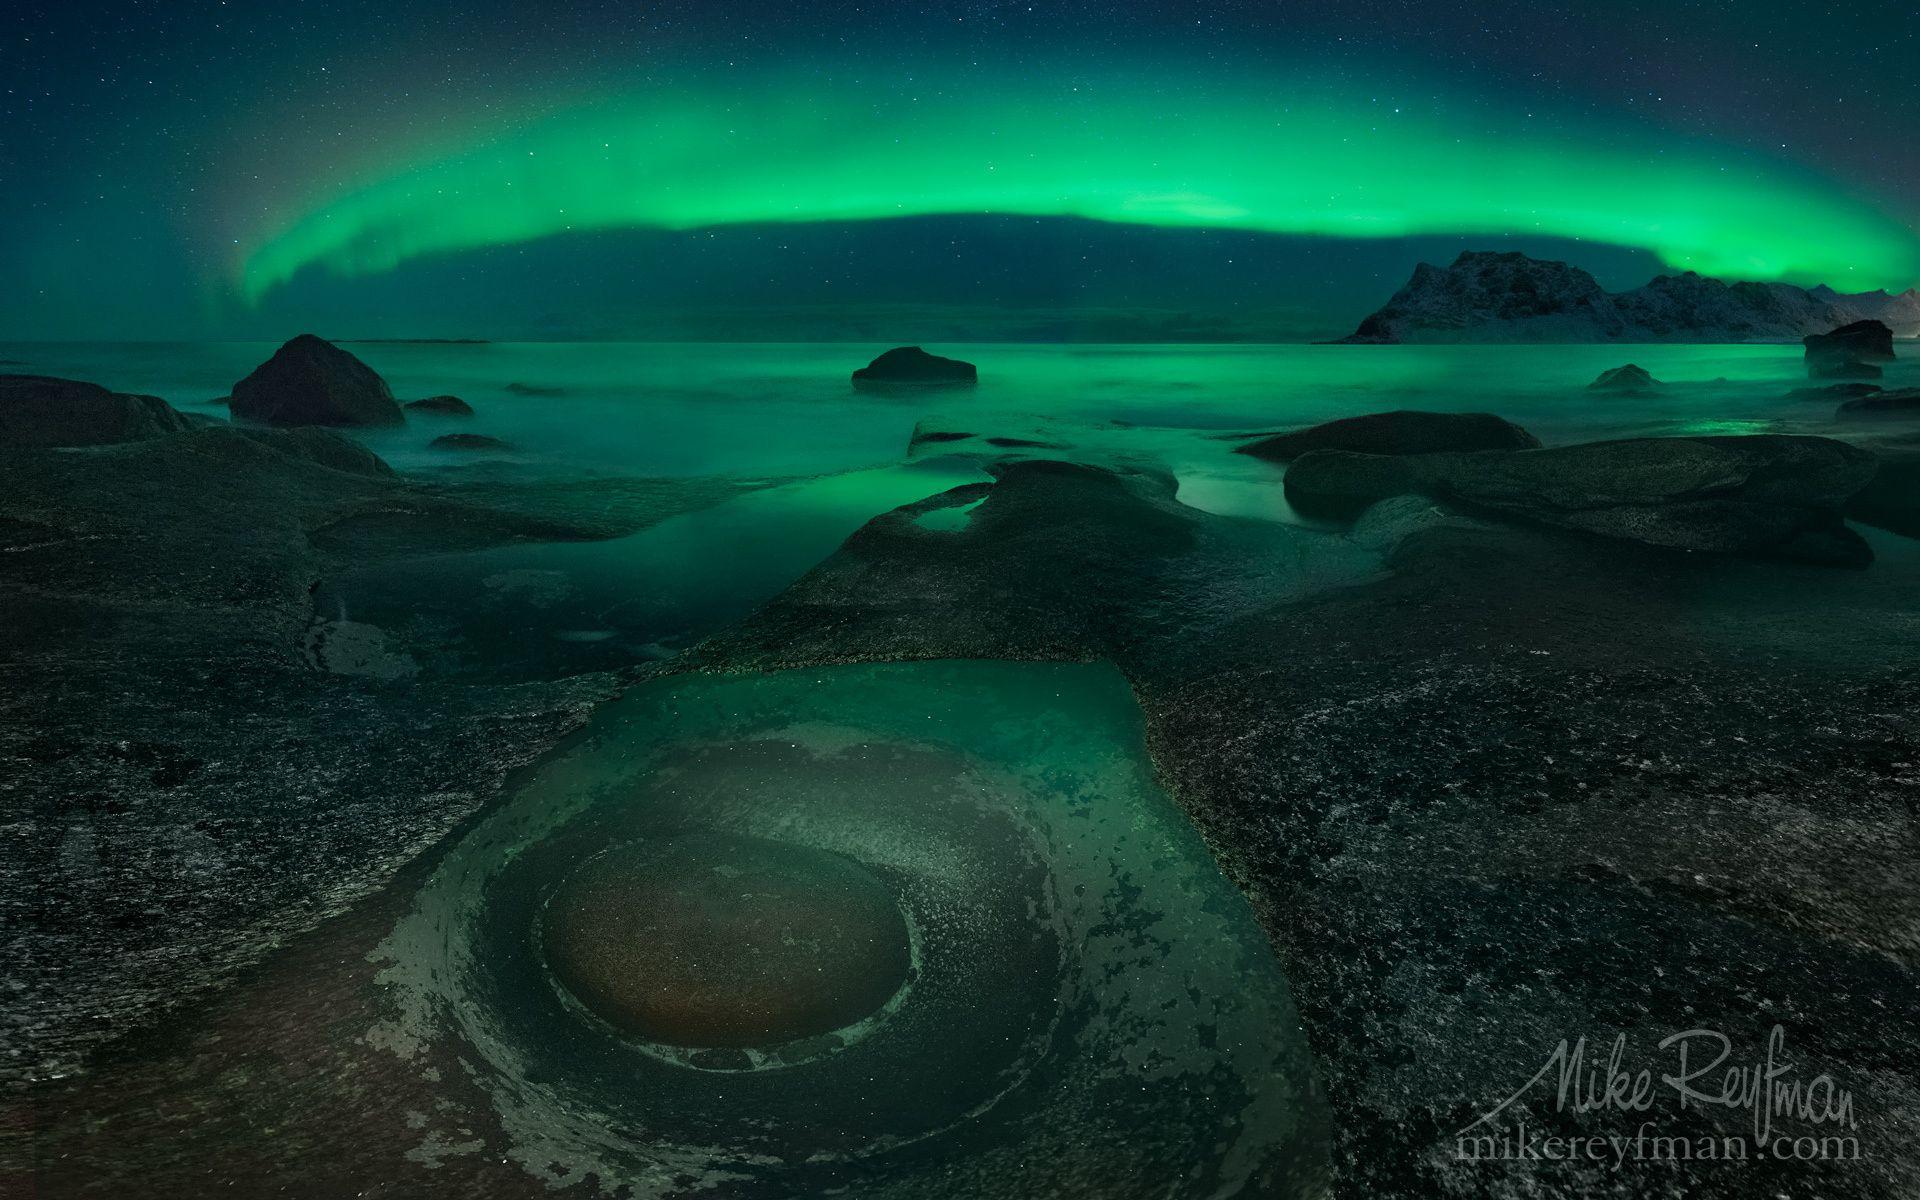 The Eye of Uttakleiv - Uttakleiv Beach, Lofoten Islands Nordland, Norway. Photography by Mike Reyfman